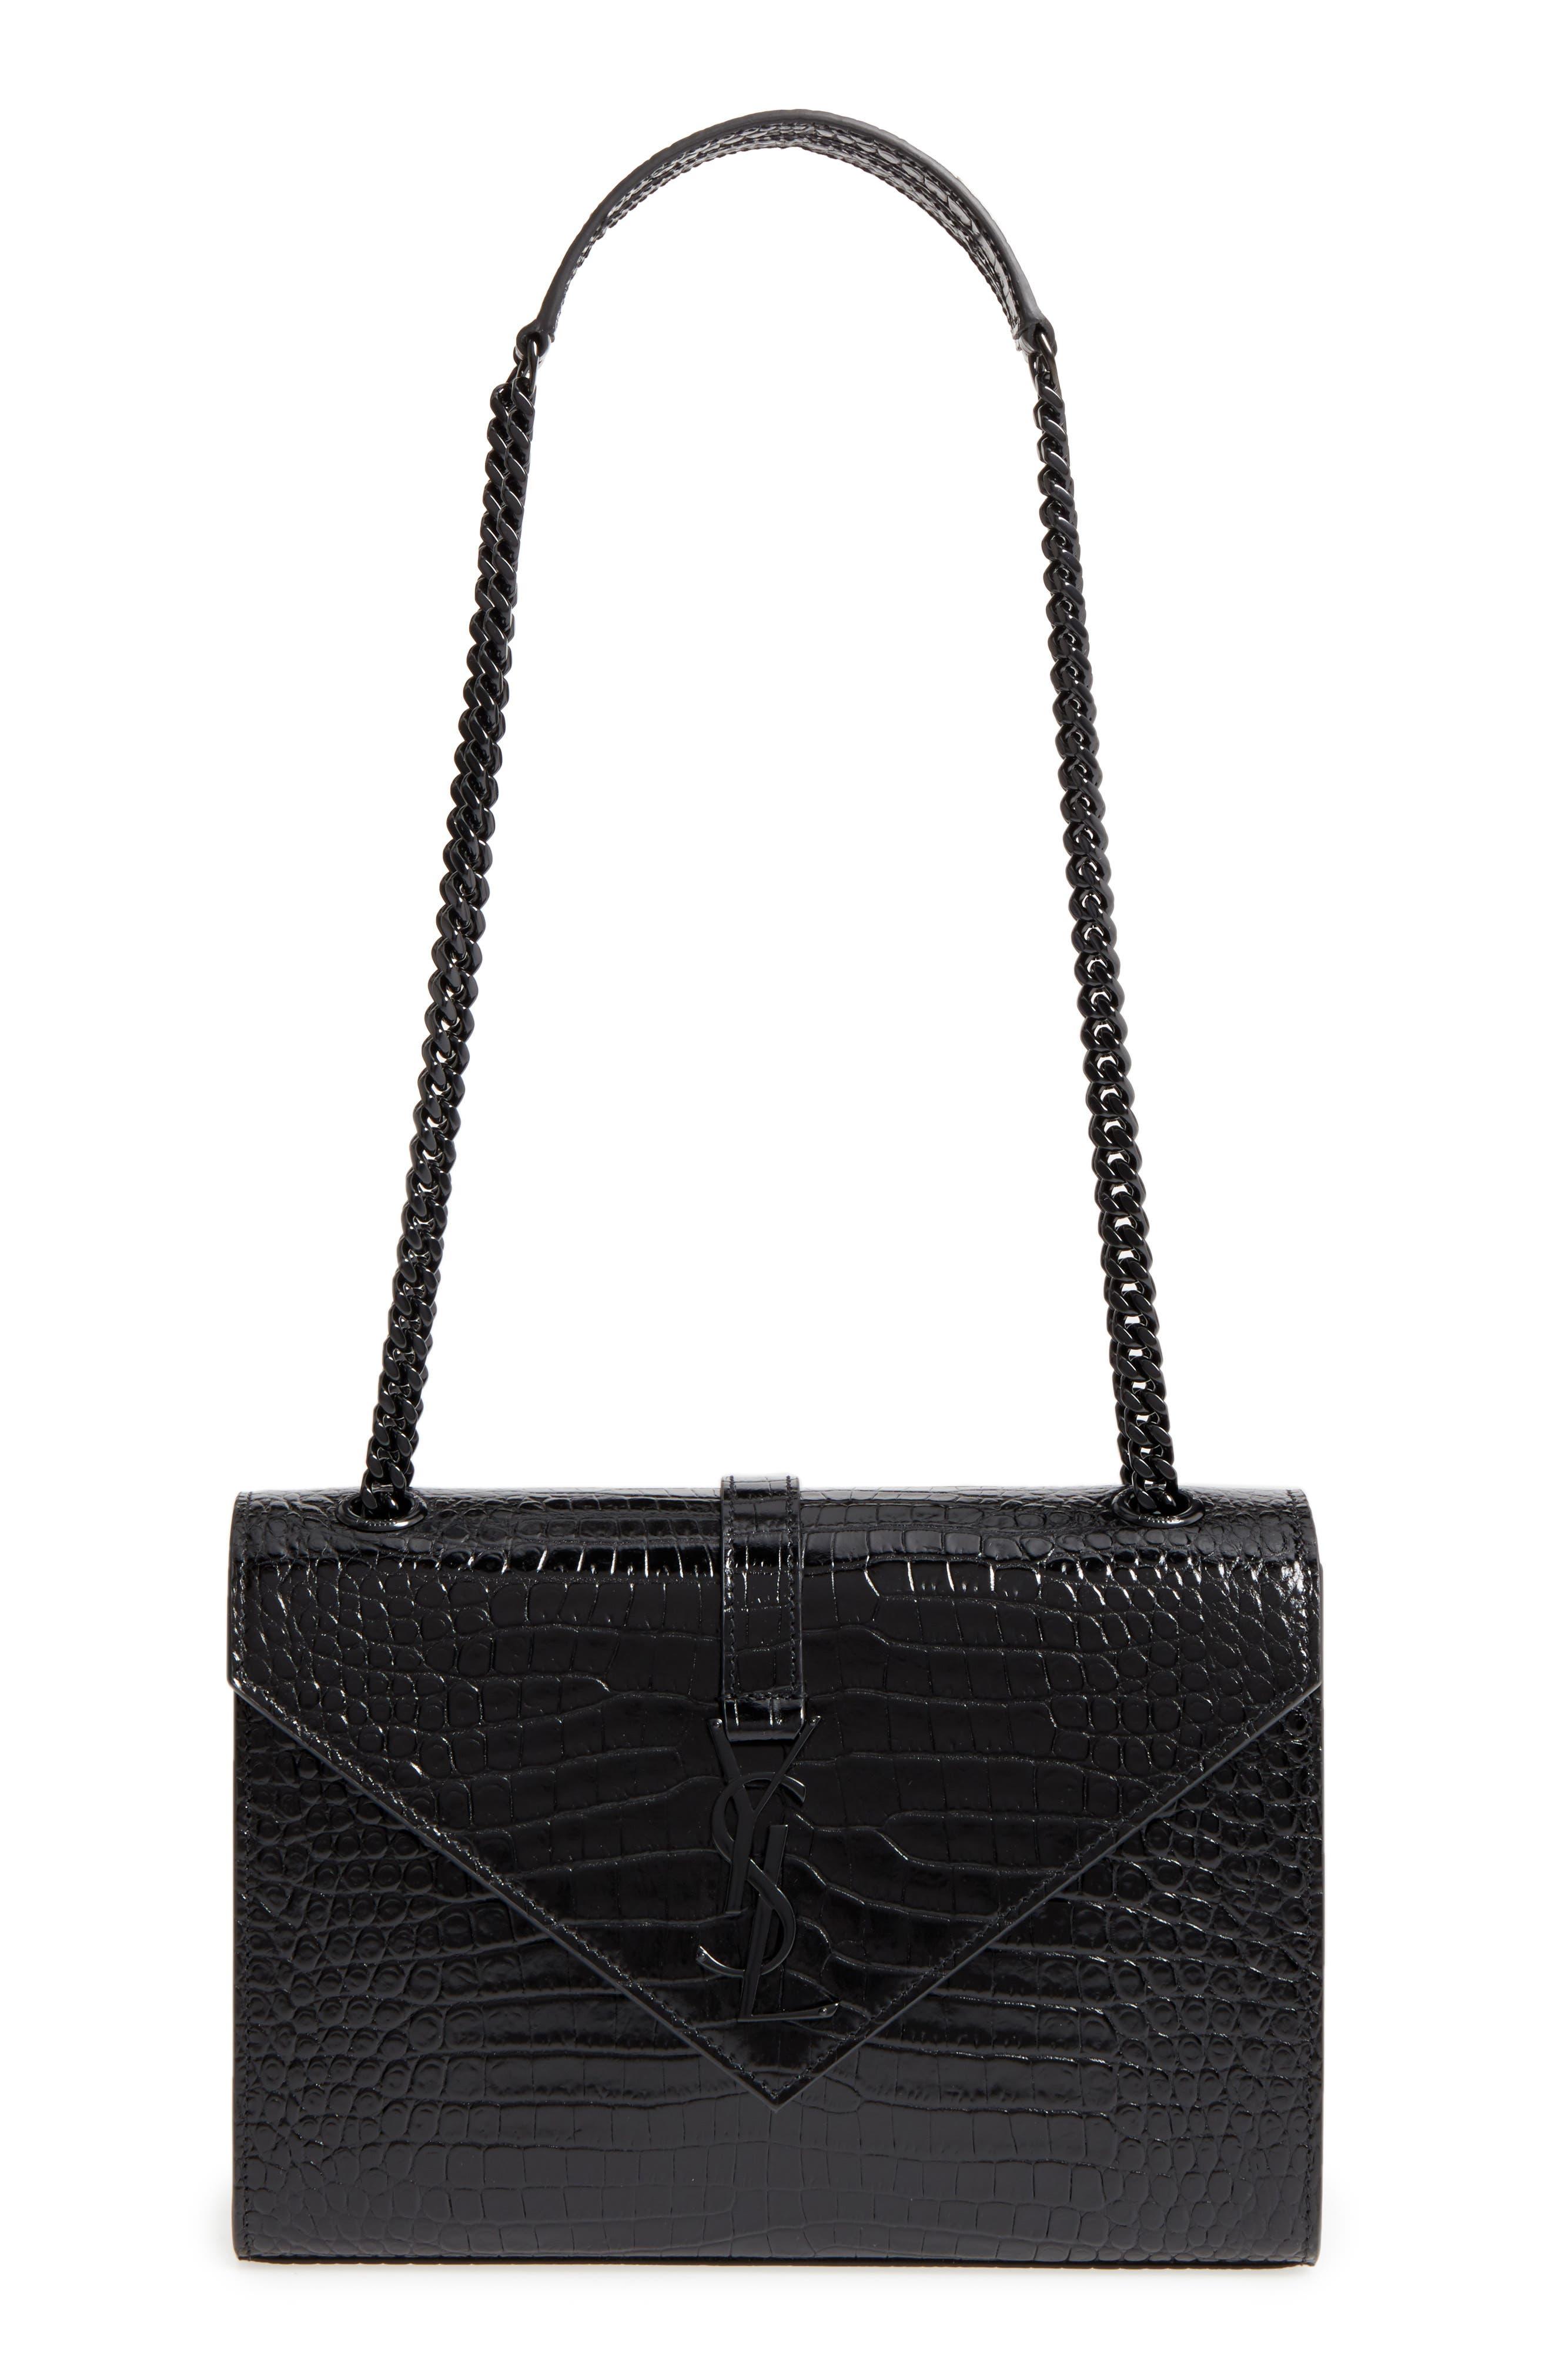 Medium Croc-Embossed Calfskin Shoulder Bag,                         Main,                         color, 001